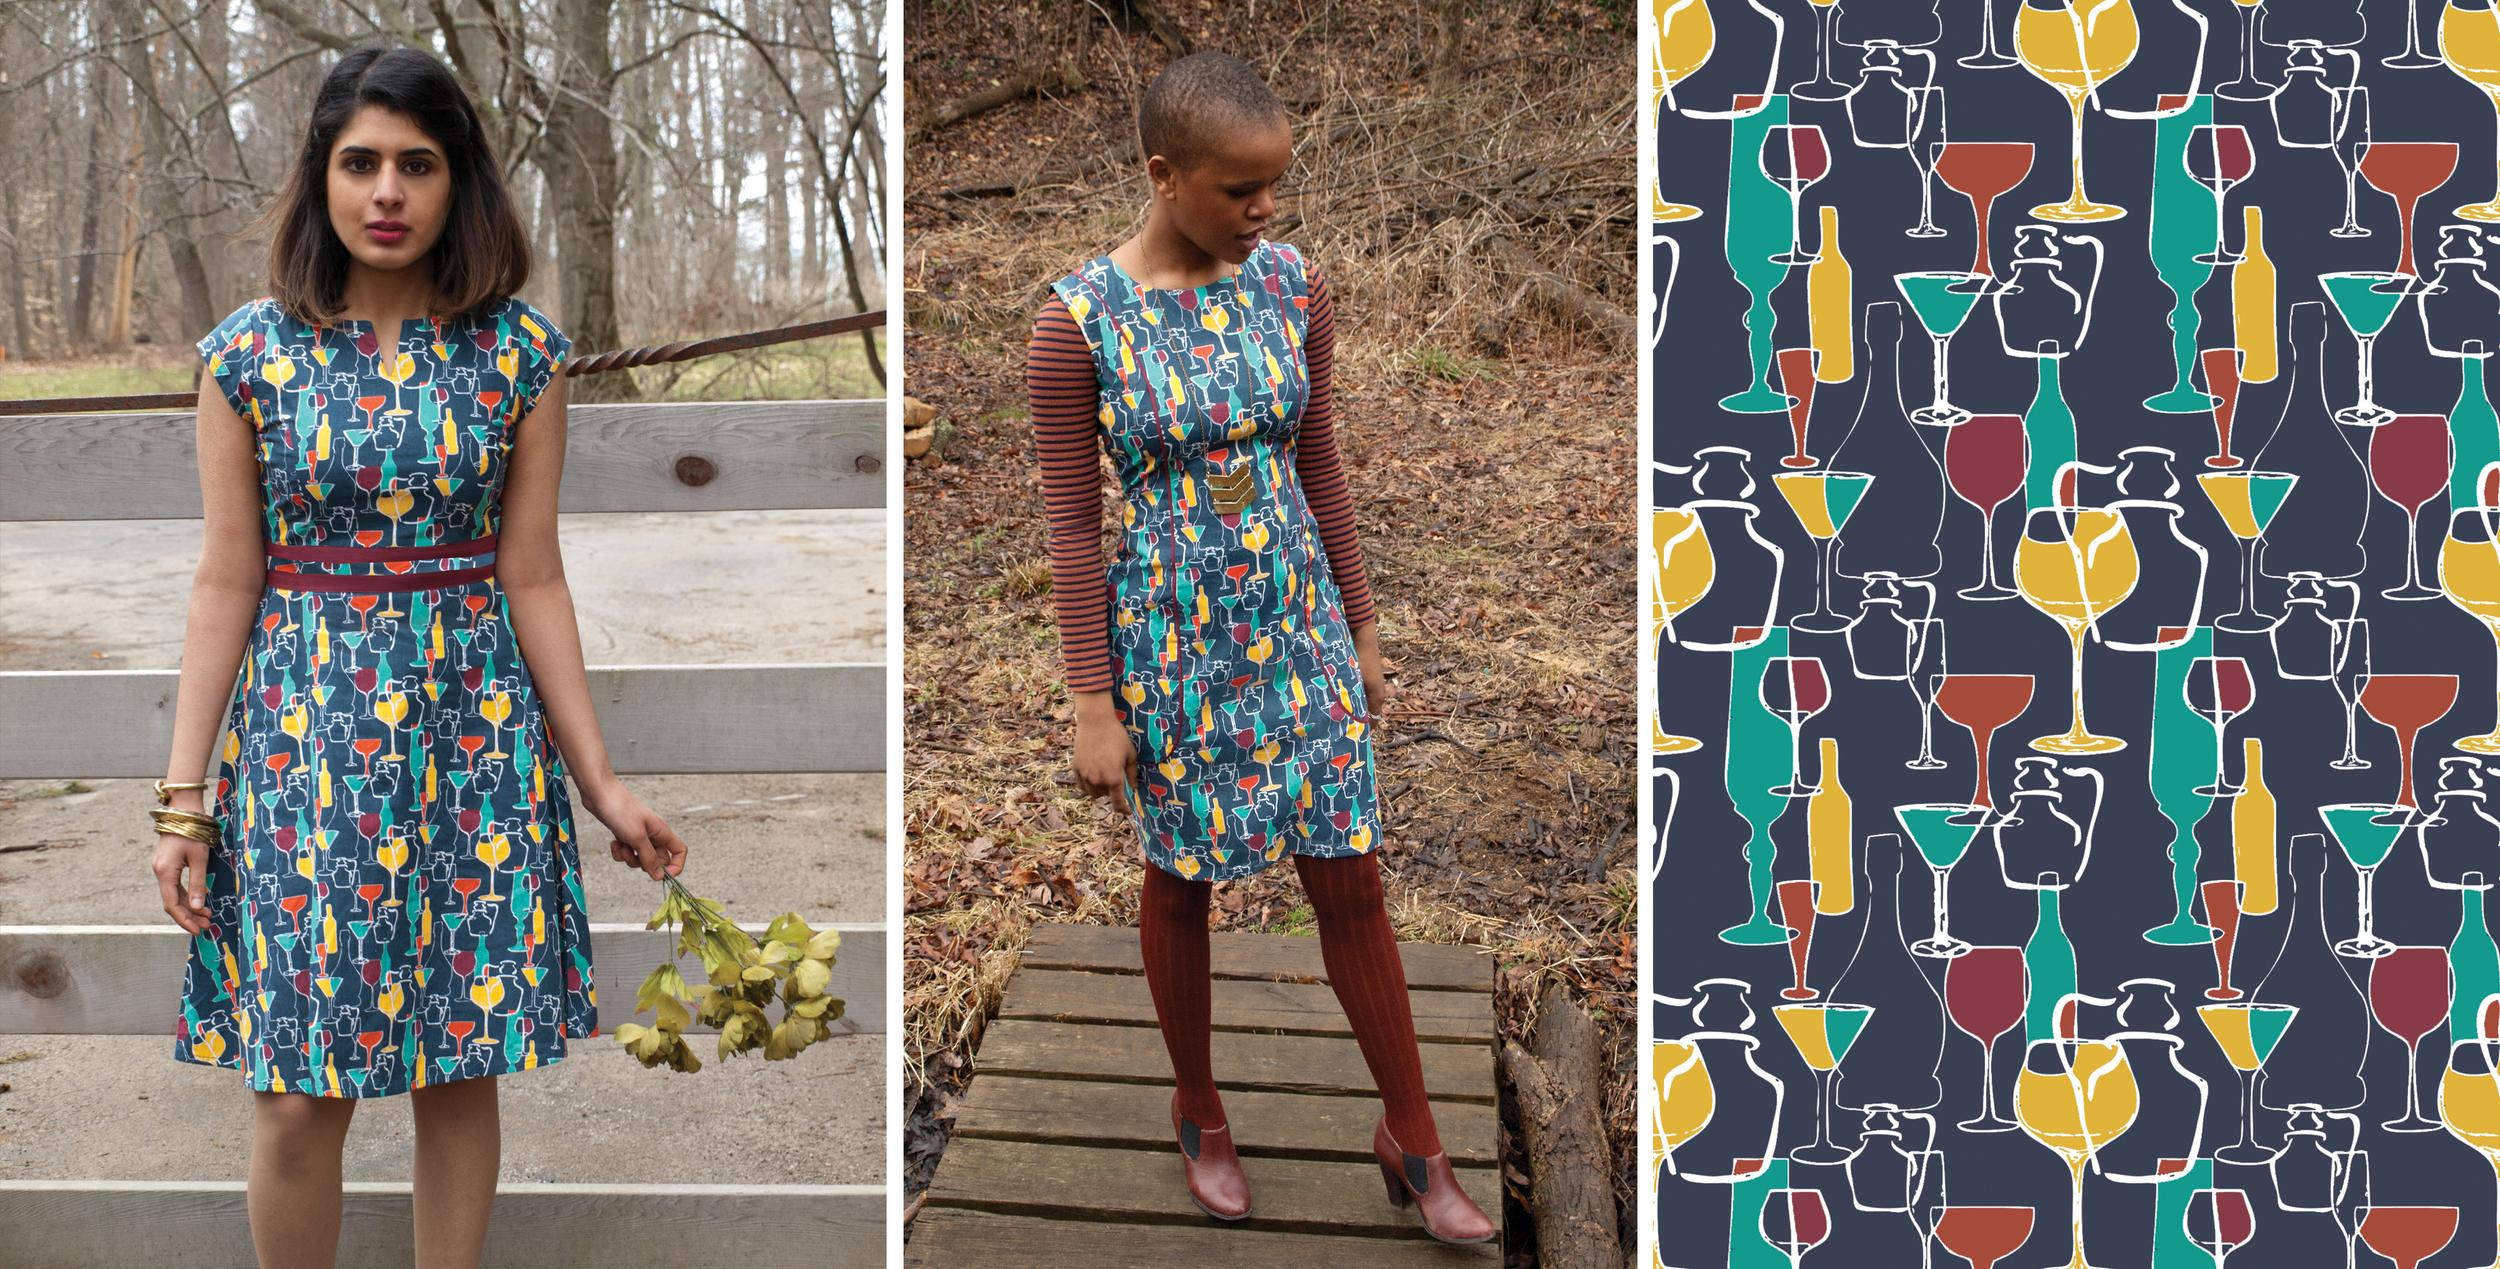 Left: First Dance Dress. Middle: Starling Pockets dress. Textile design by Shifra Whiteman.